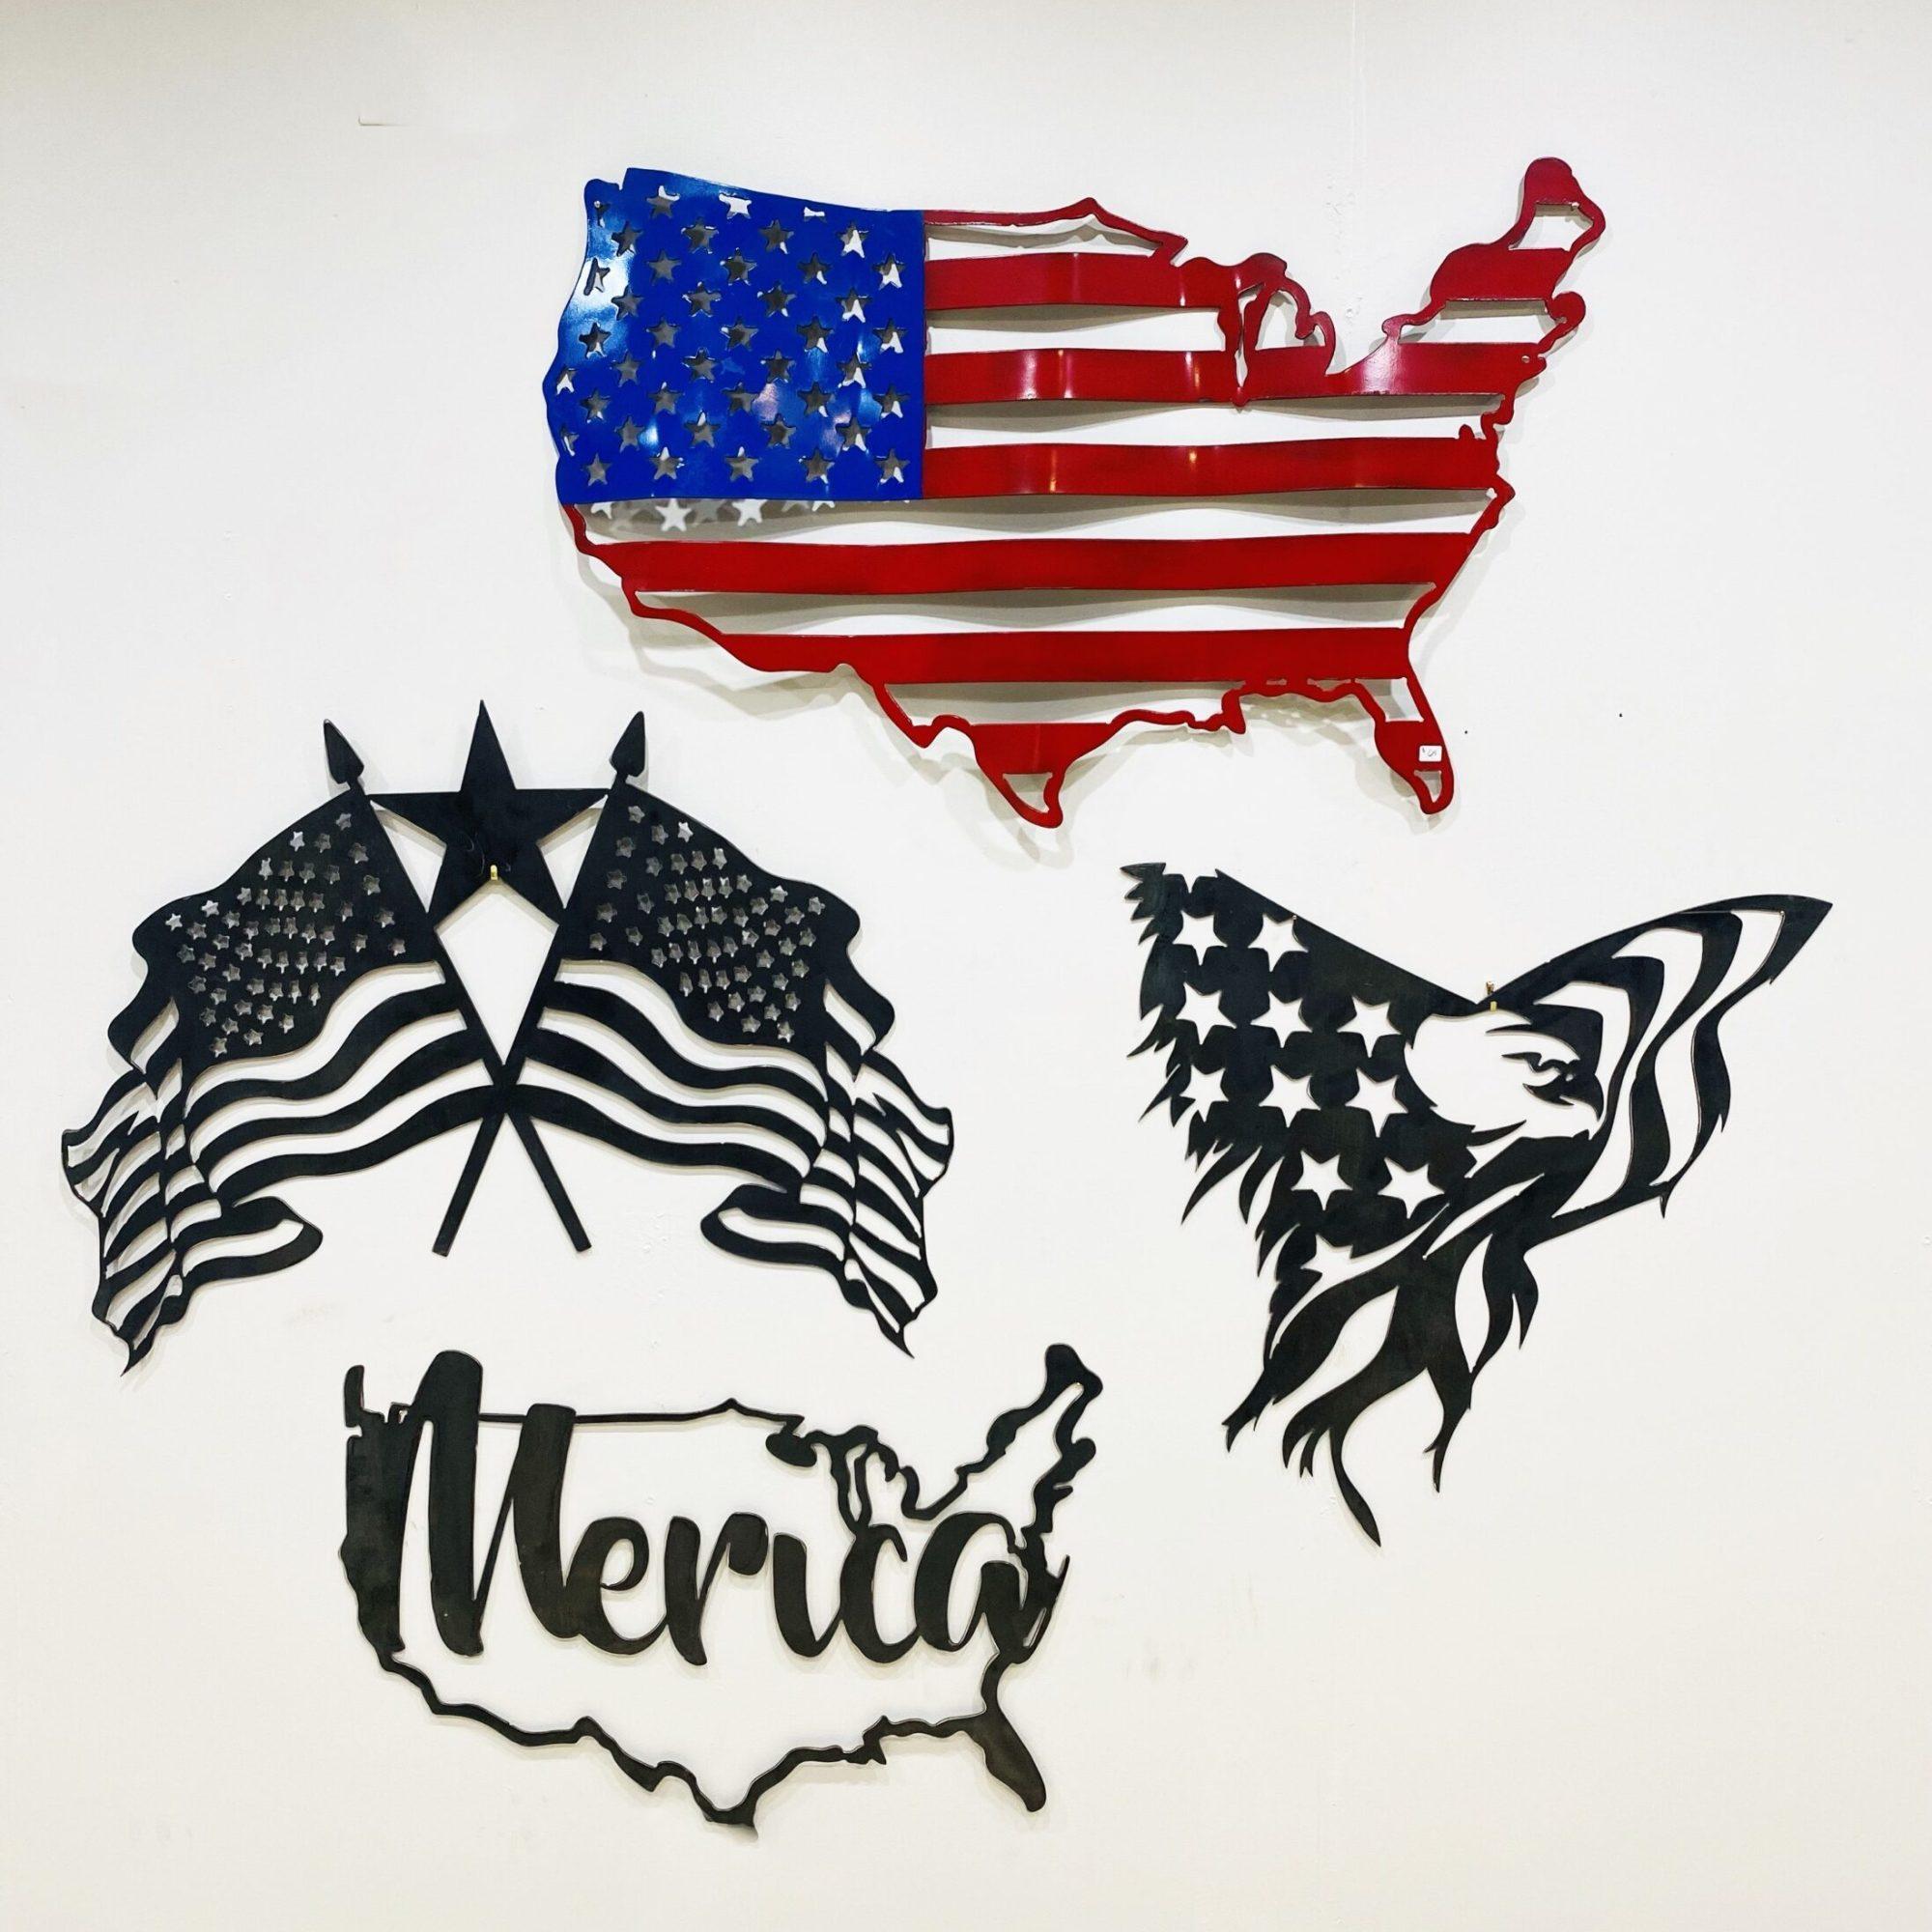 Custom metal designs at Welding Shop 12928 Lowden Ln. Austin, Texas 78652